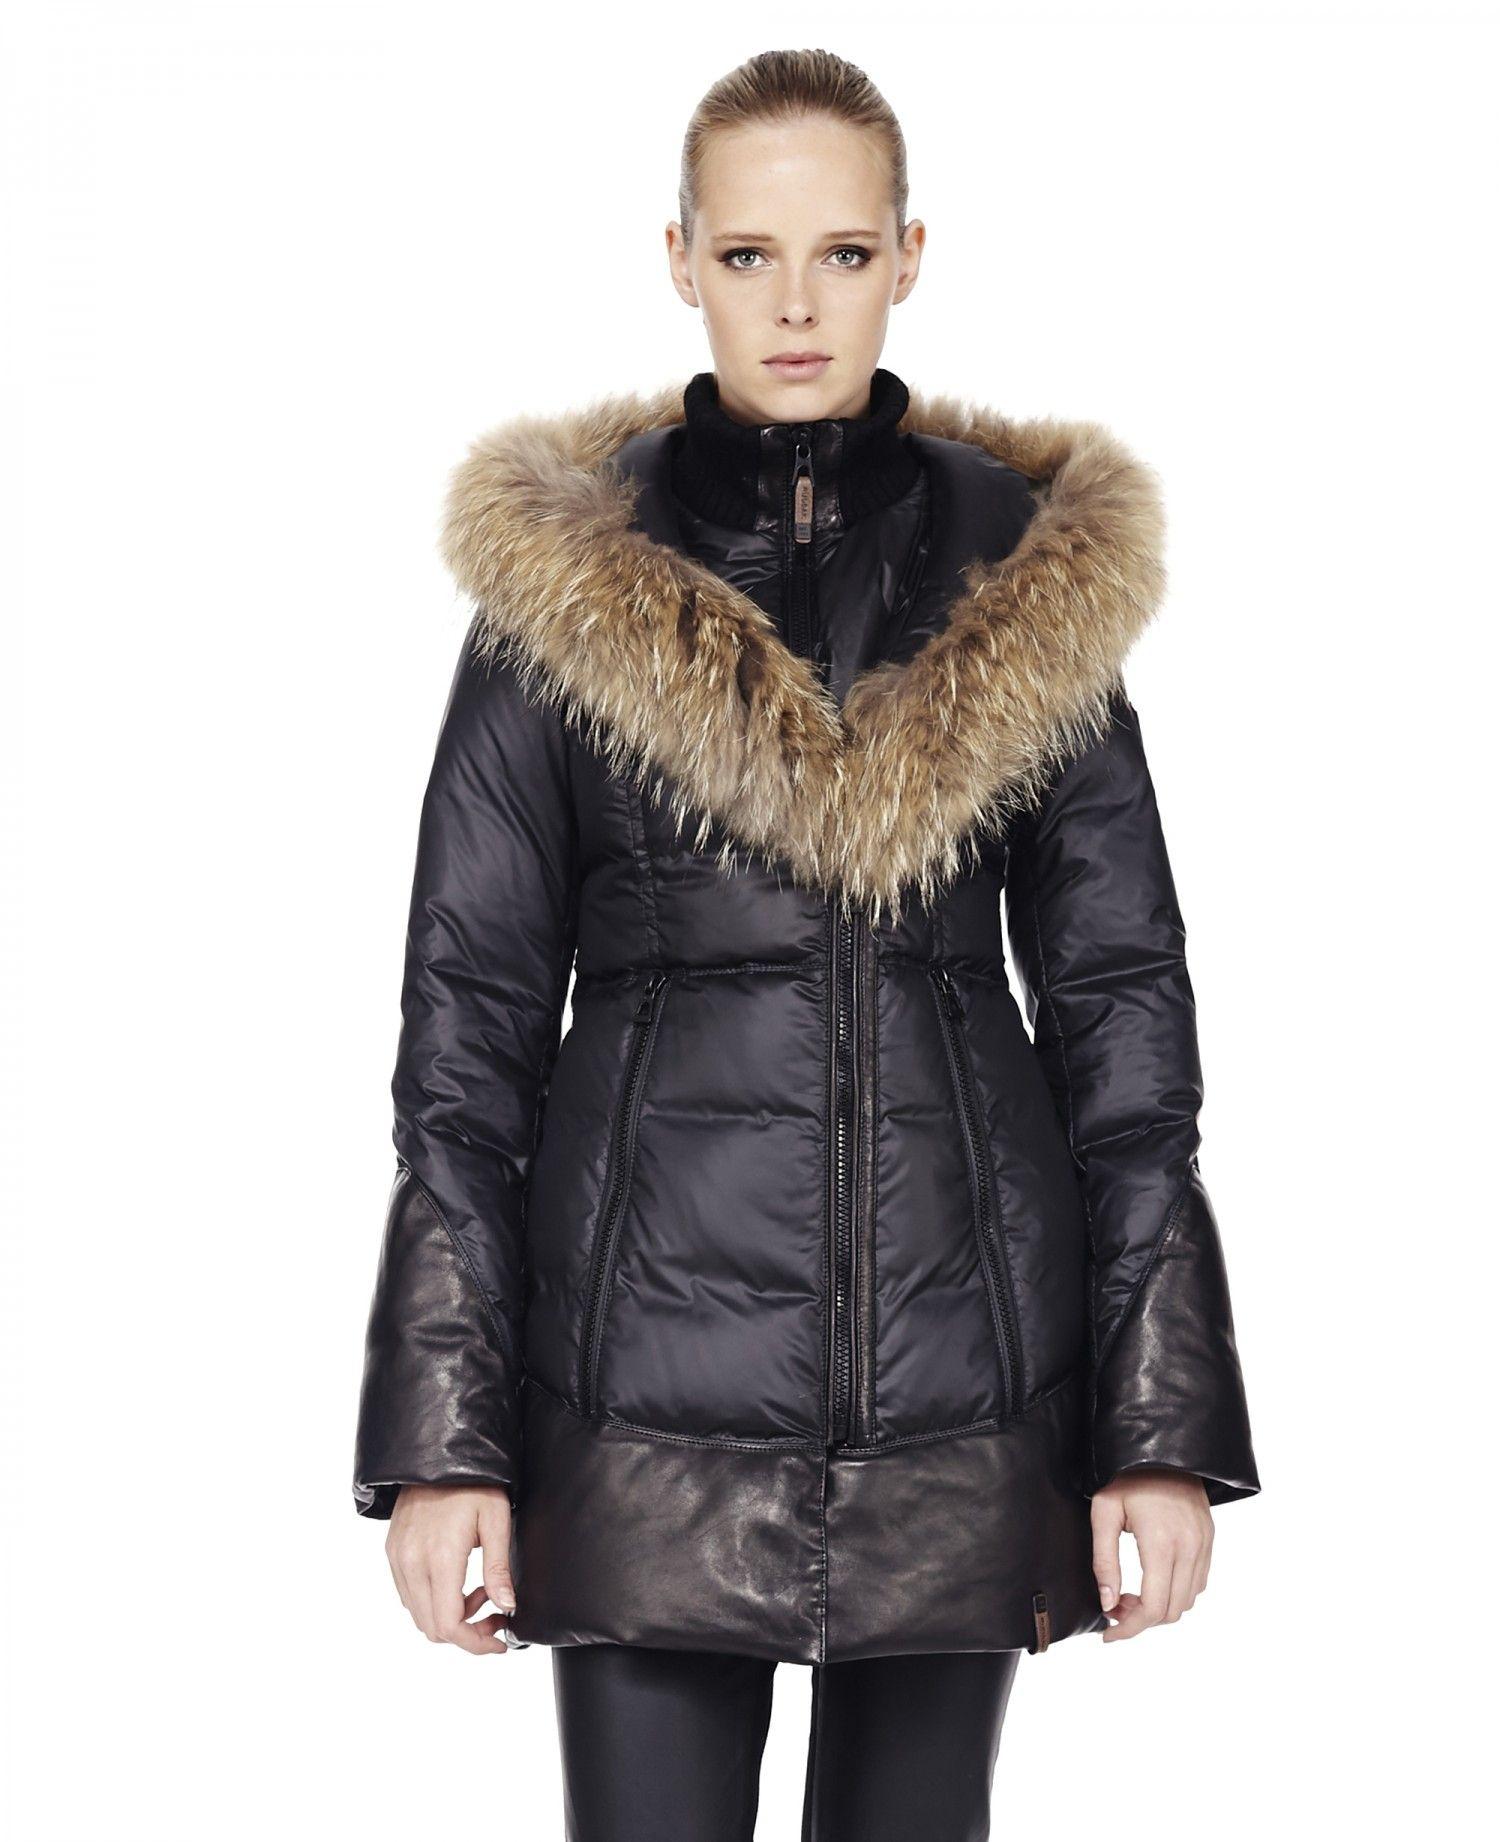 rudsak online sample sale offer black pongee woven leather #0: d f52e7835a01d2dba07abaa0